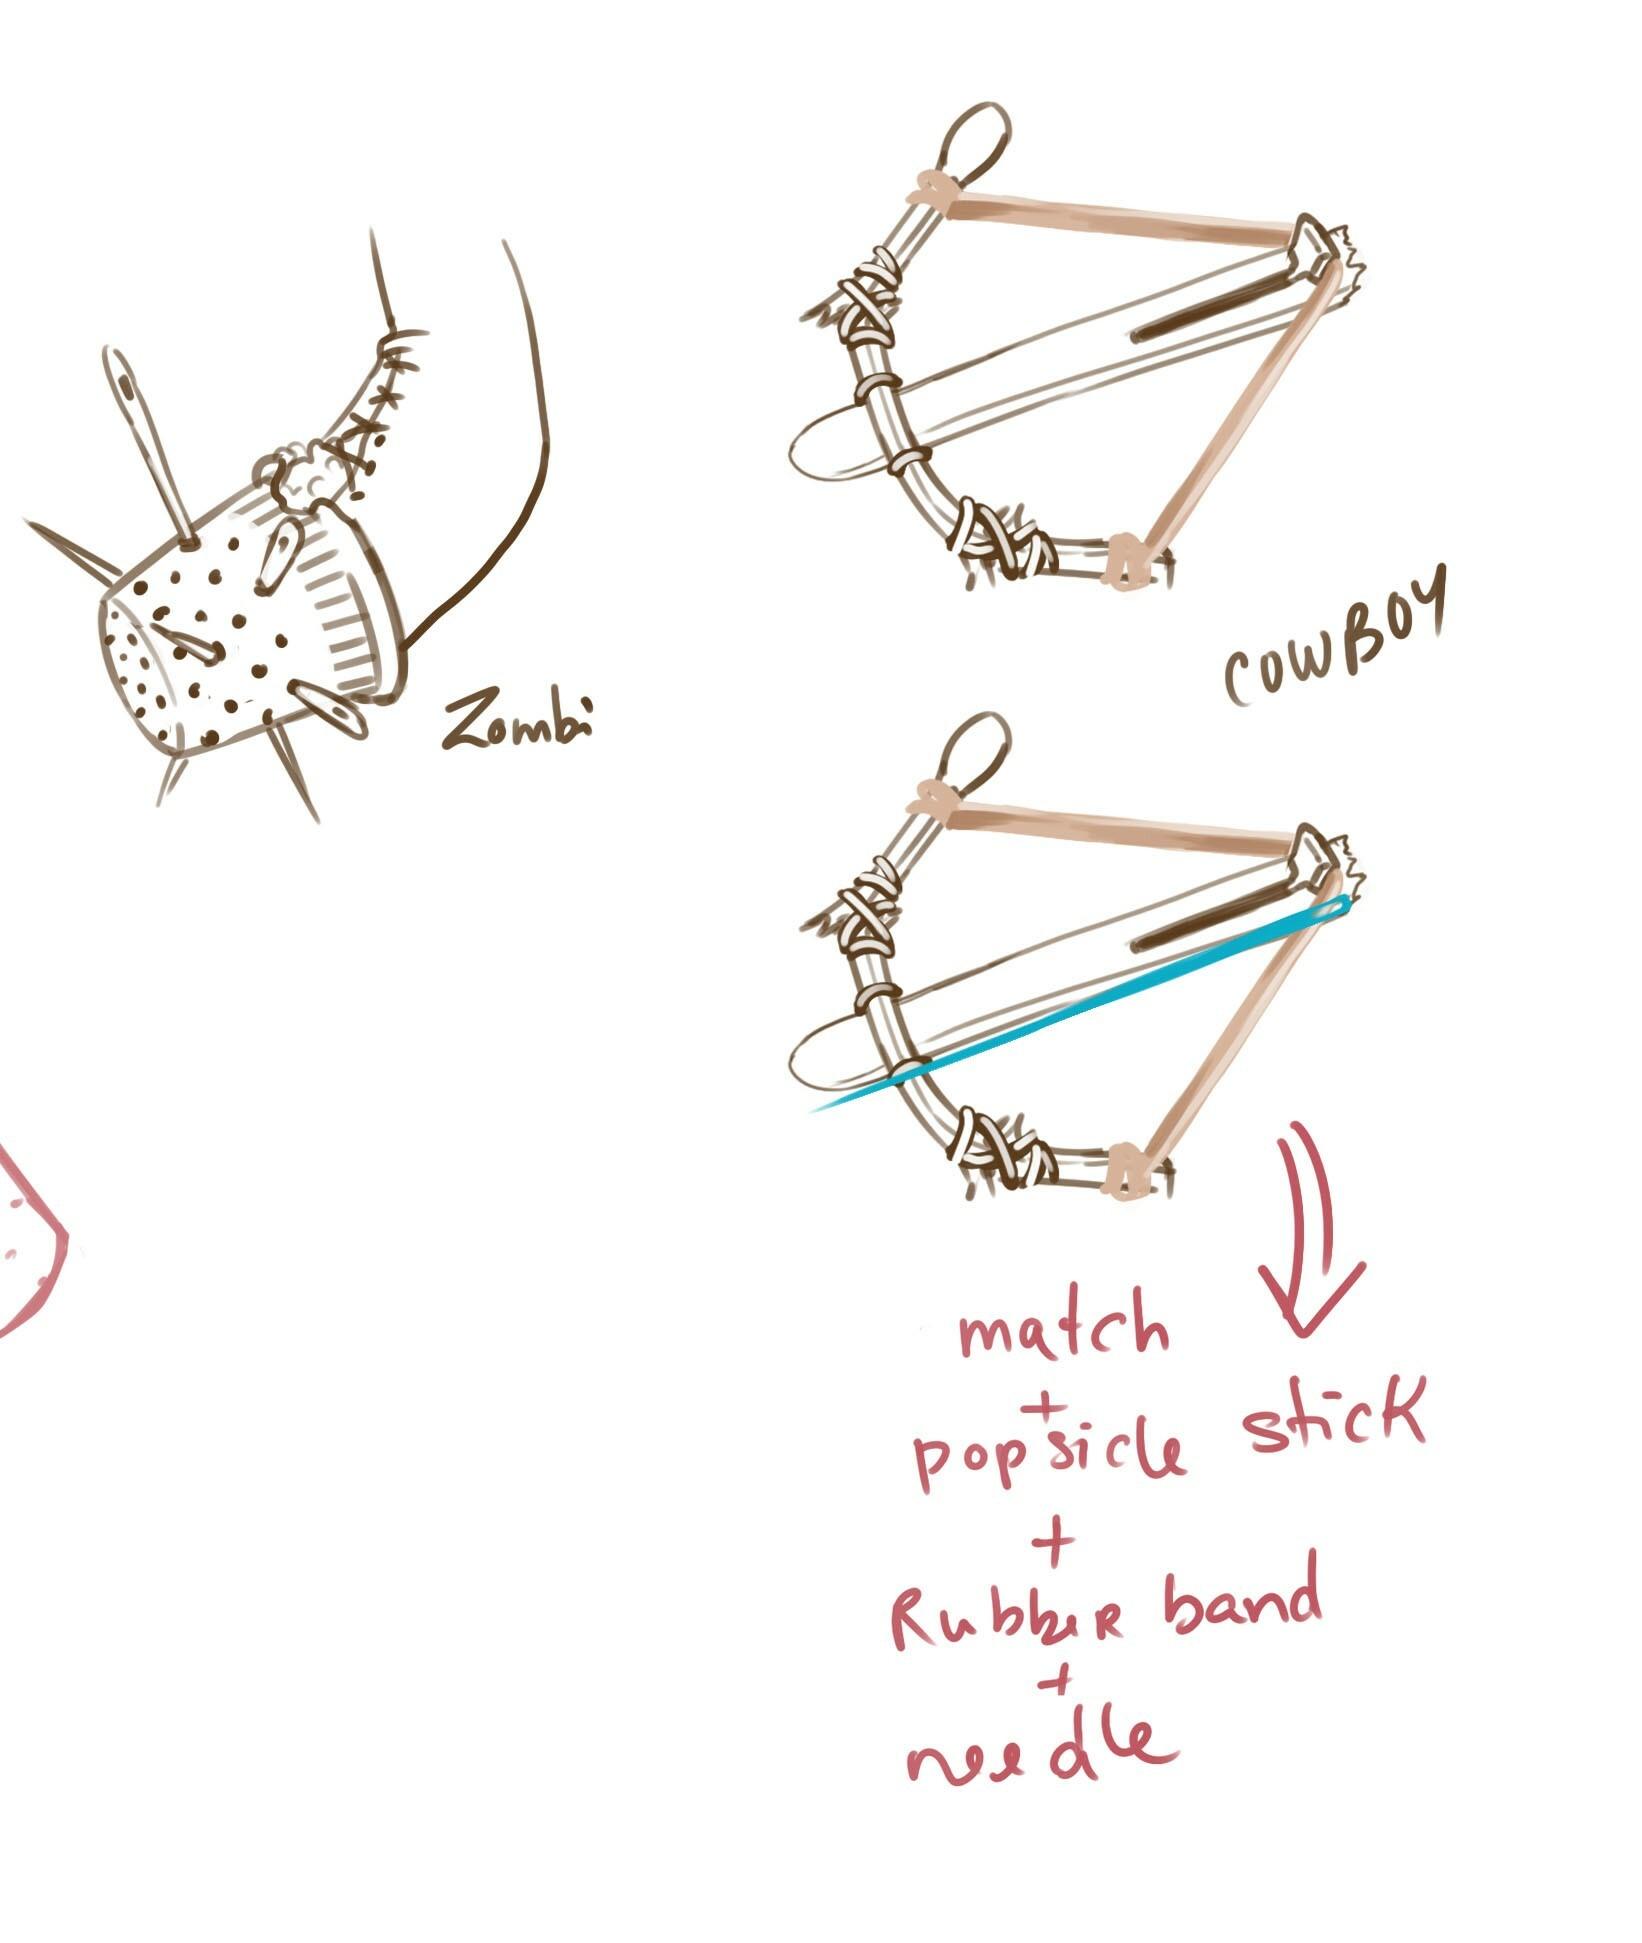 Concepts by Tiffani Trogi